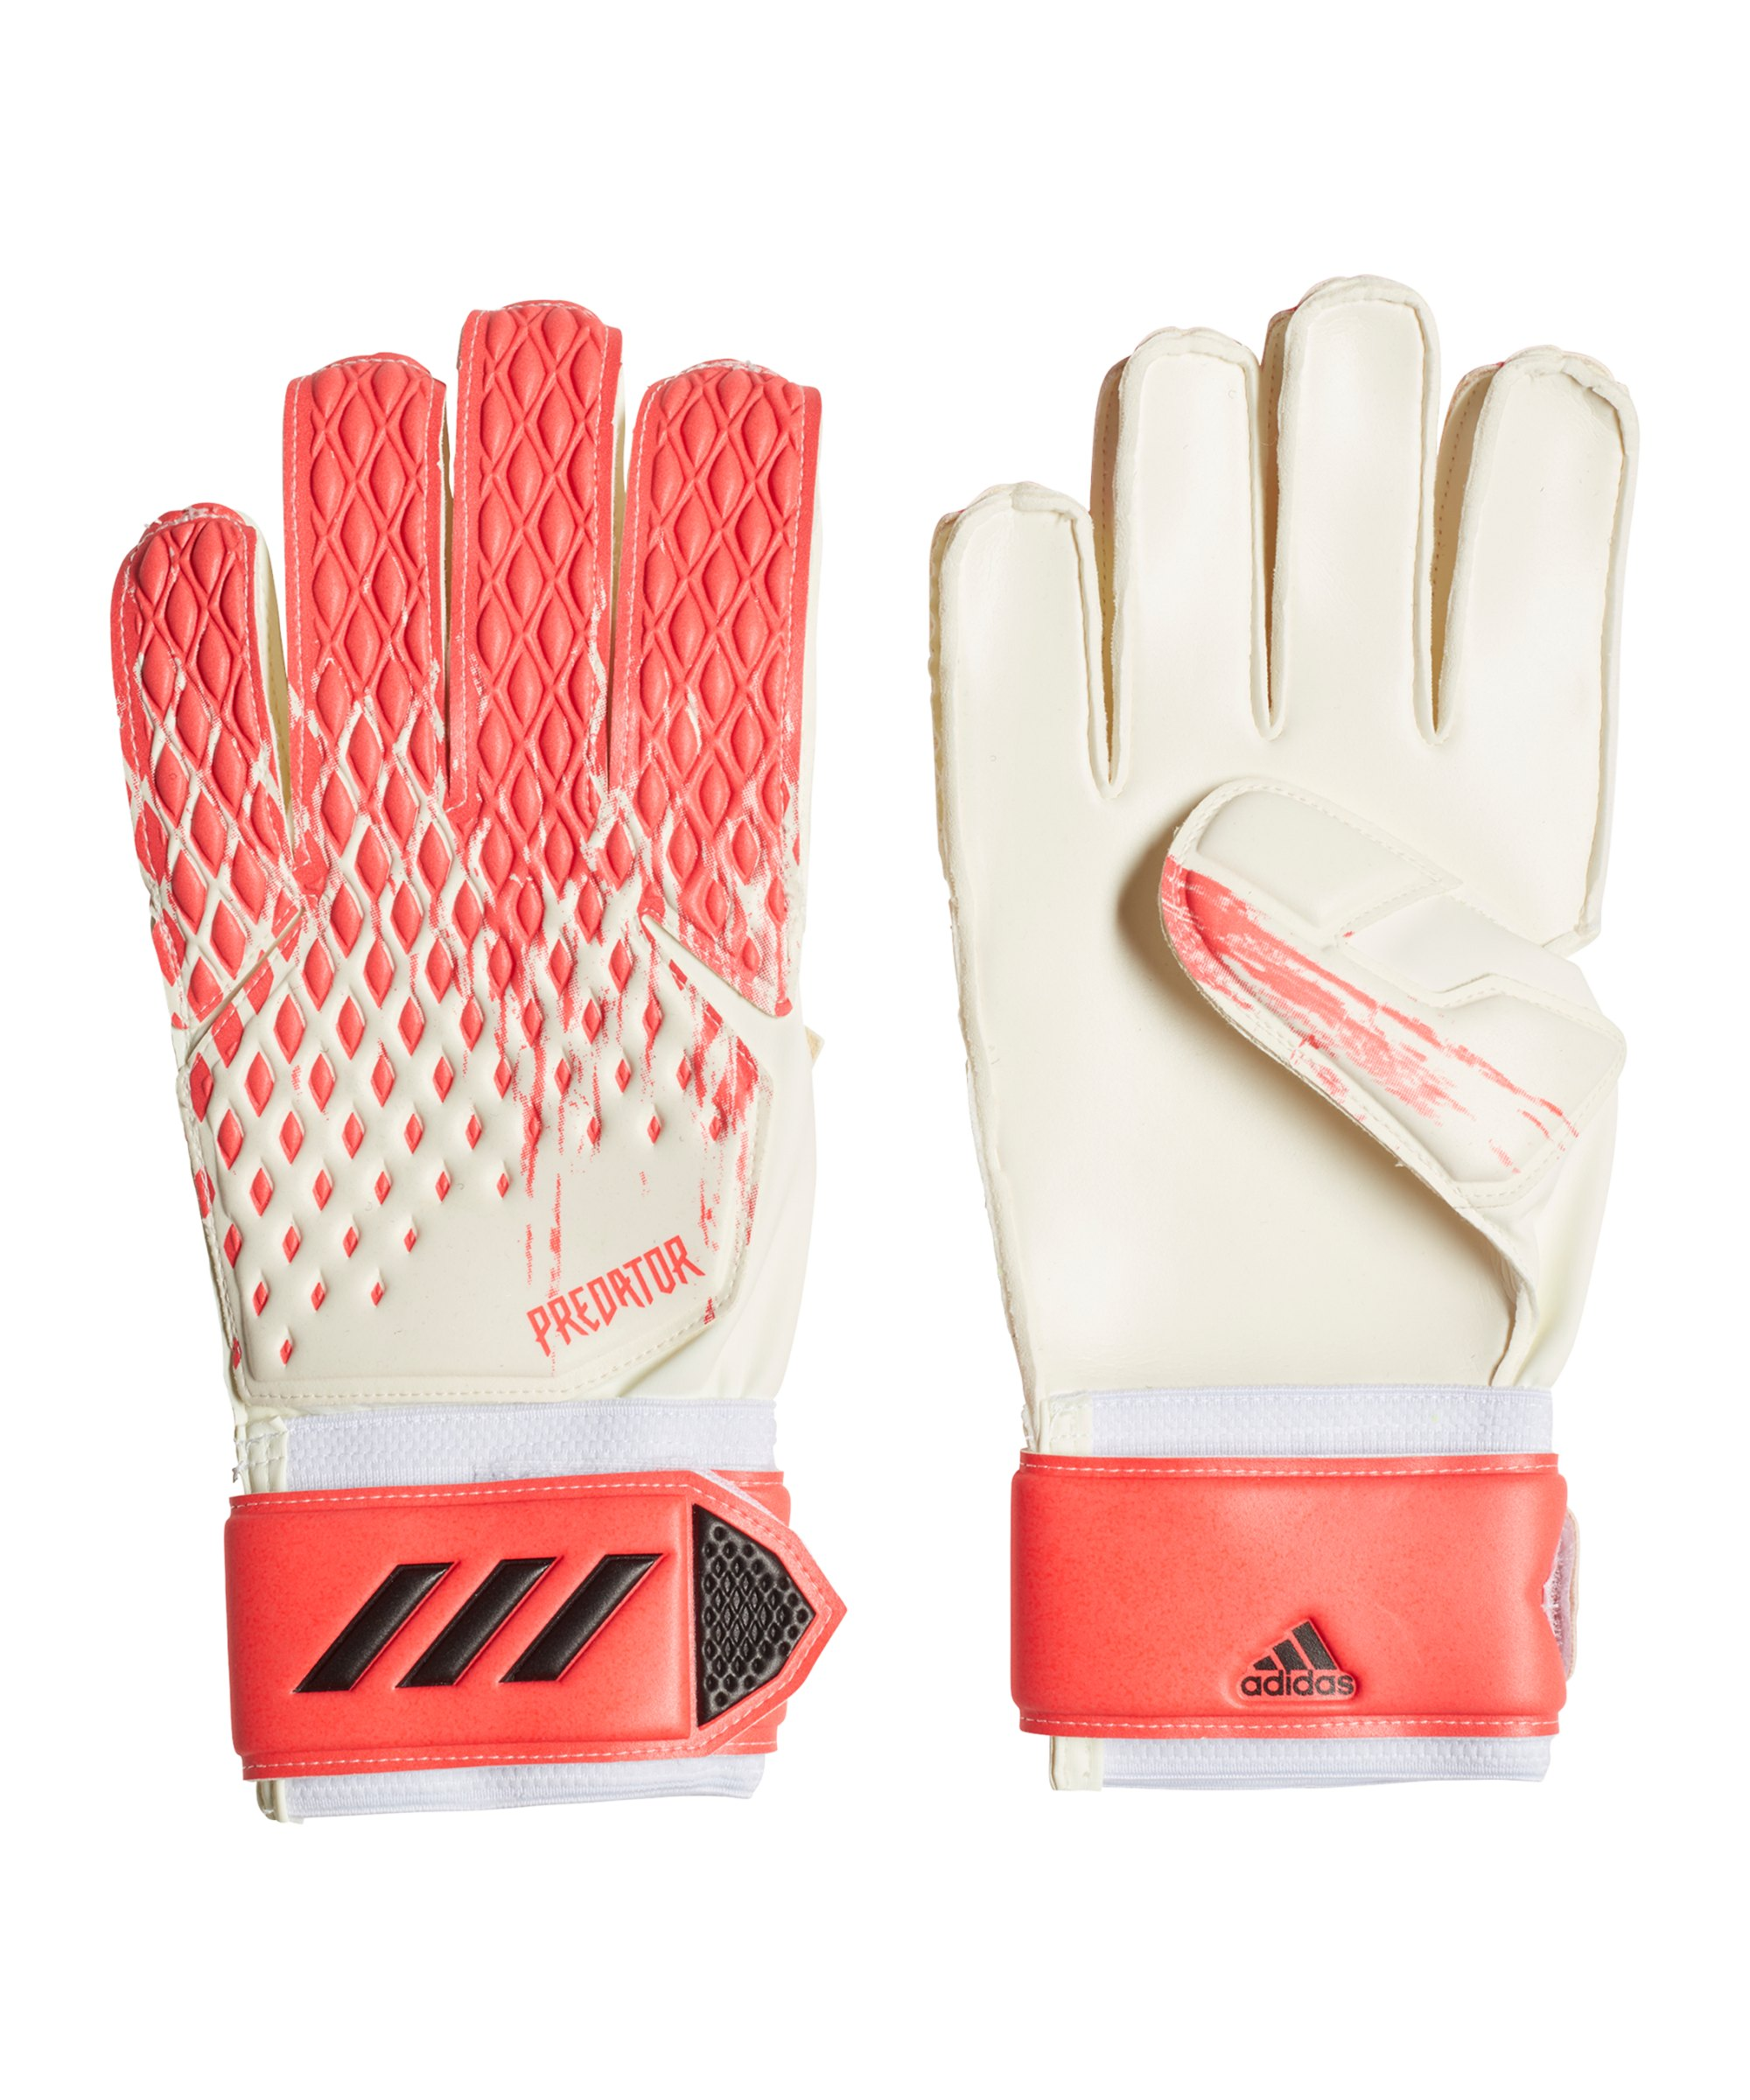 adidas Predator MTC TW-Handschuh Weiss Rosa - weiss